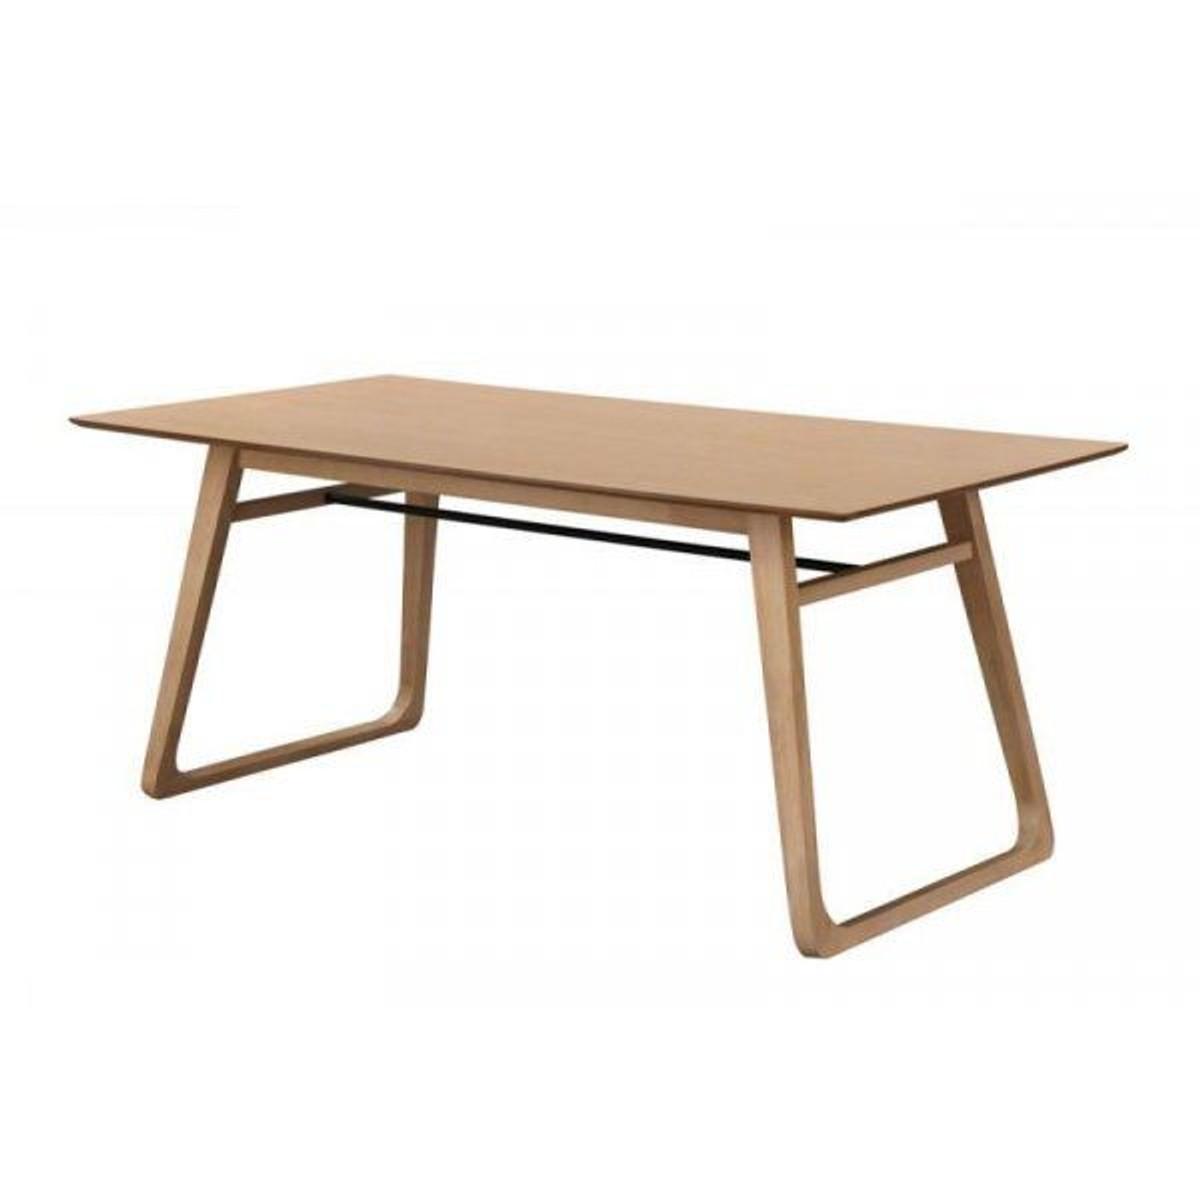 A Et Manger Dining TableFurniture KareProducts Bench Table l1KcTJF